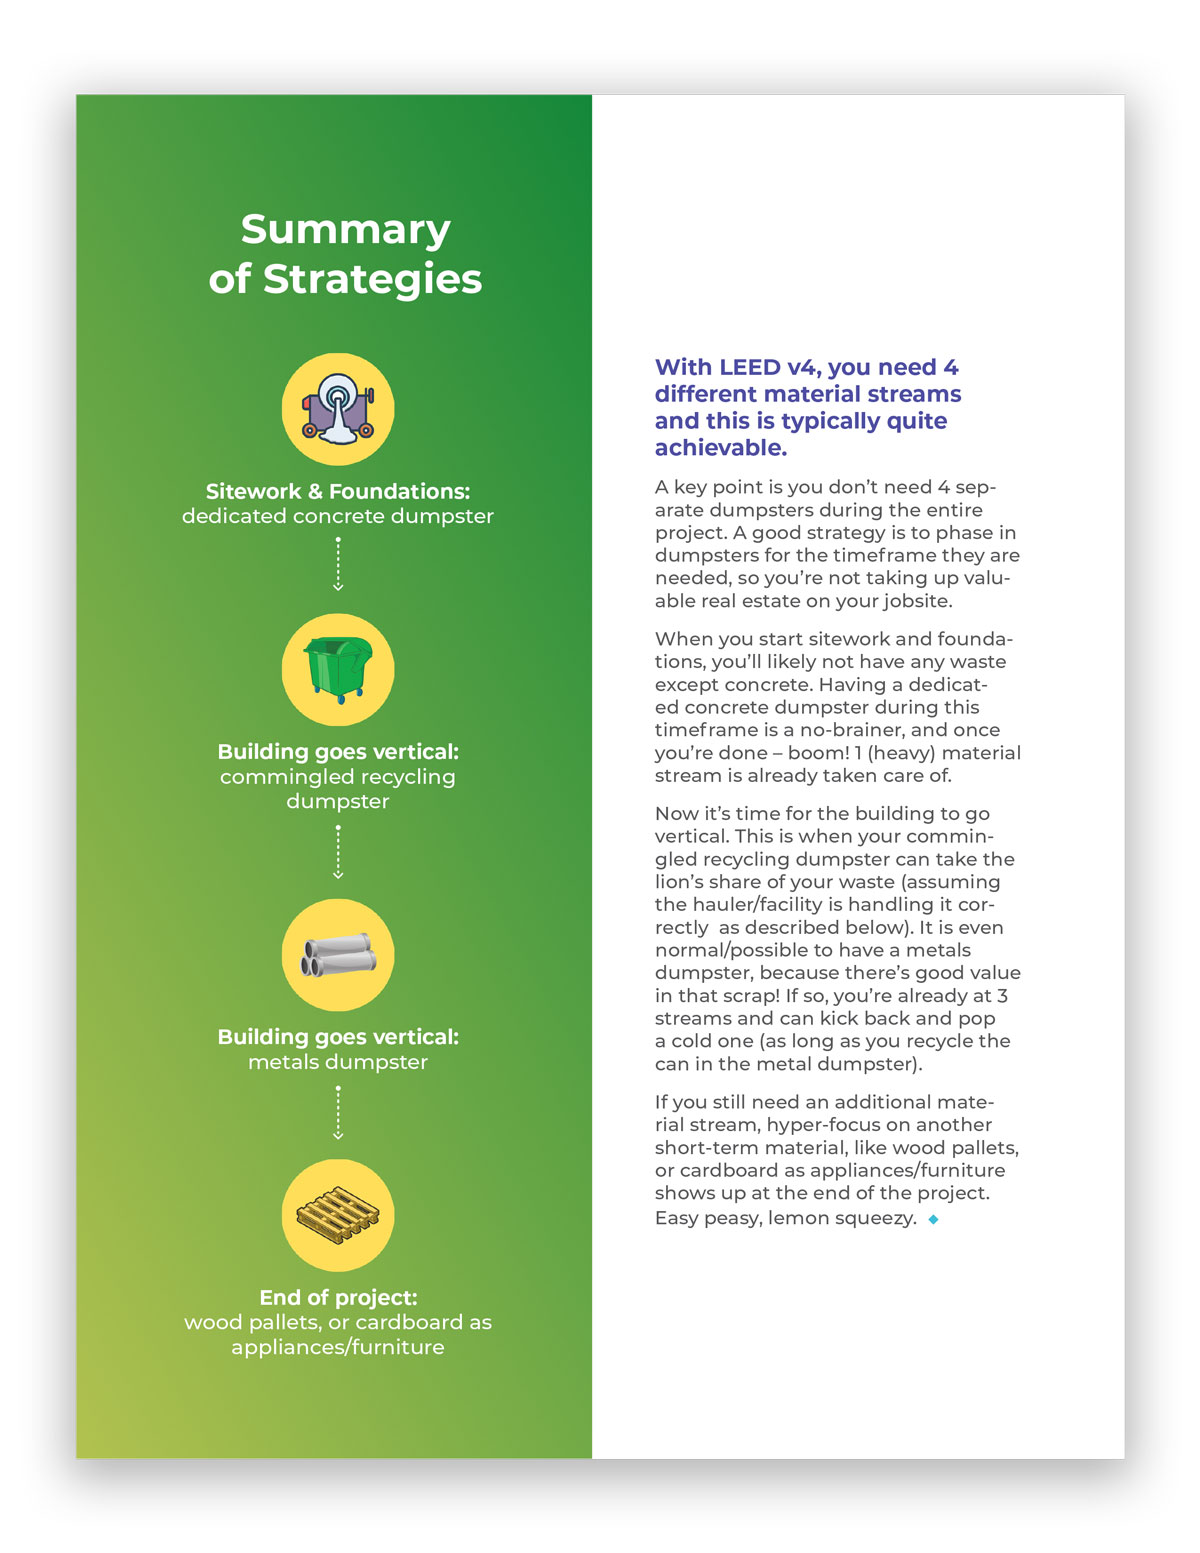 mrc5-ebook-greenbadger-strategies